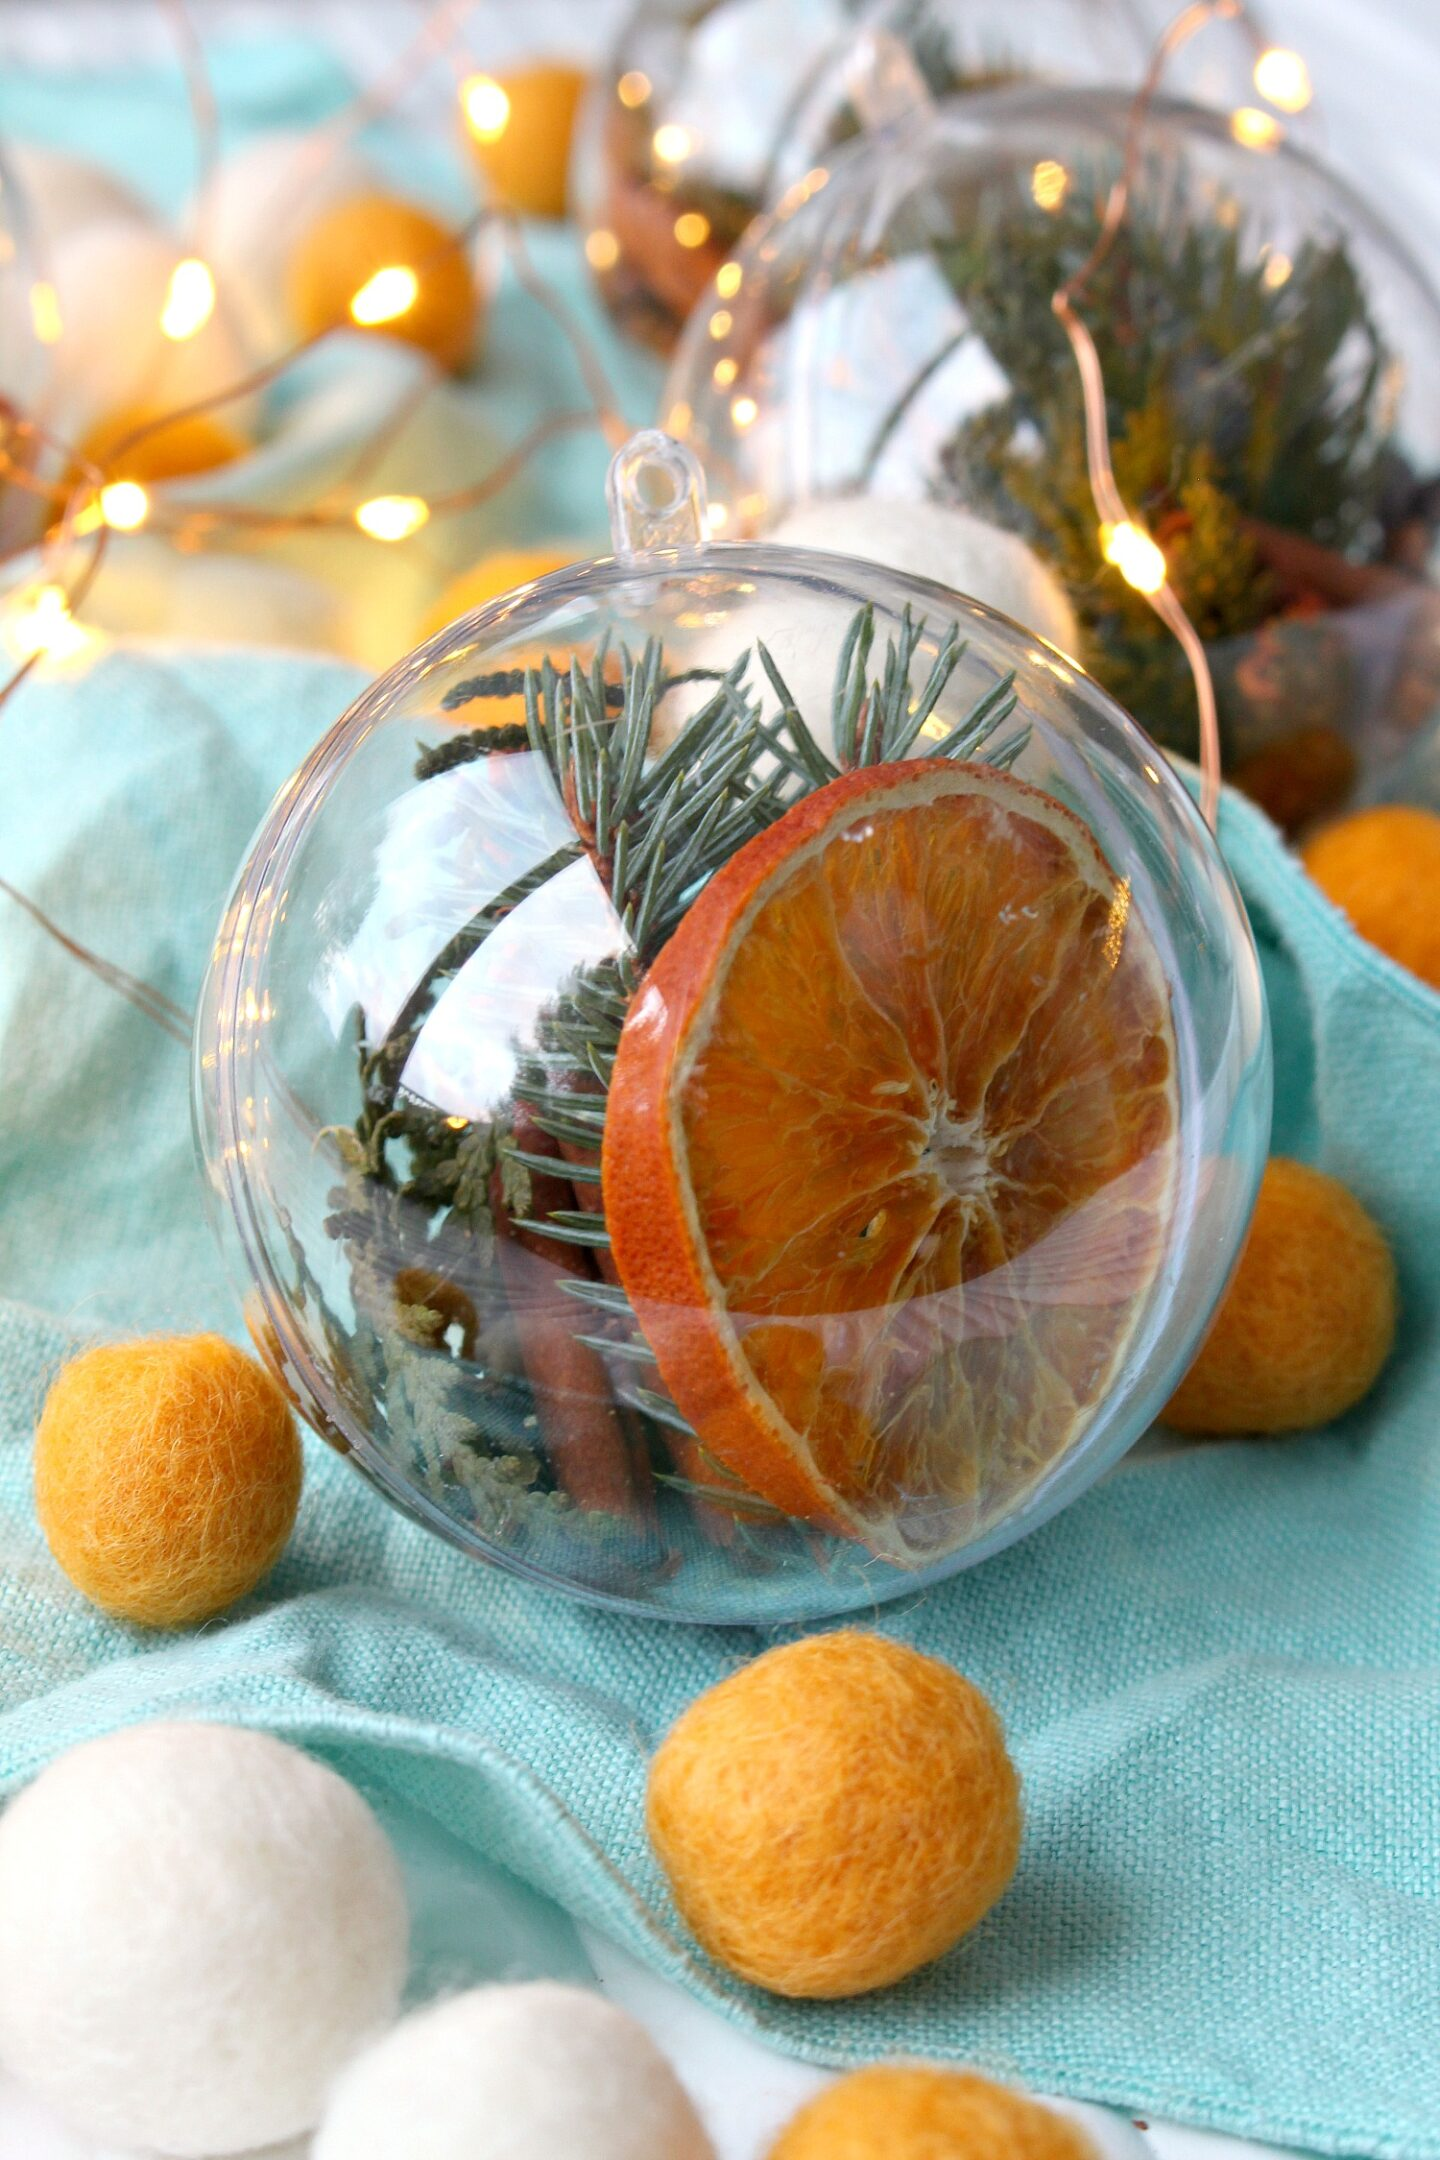 DIY Stove Top Potpourri Ornament